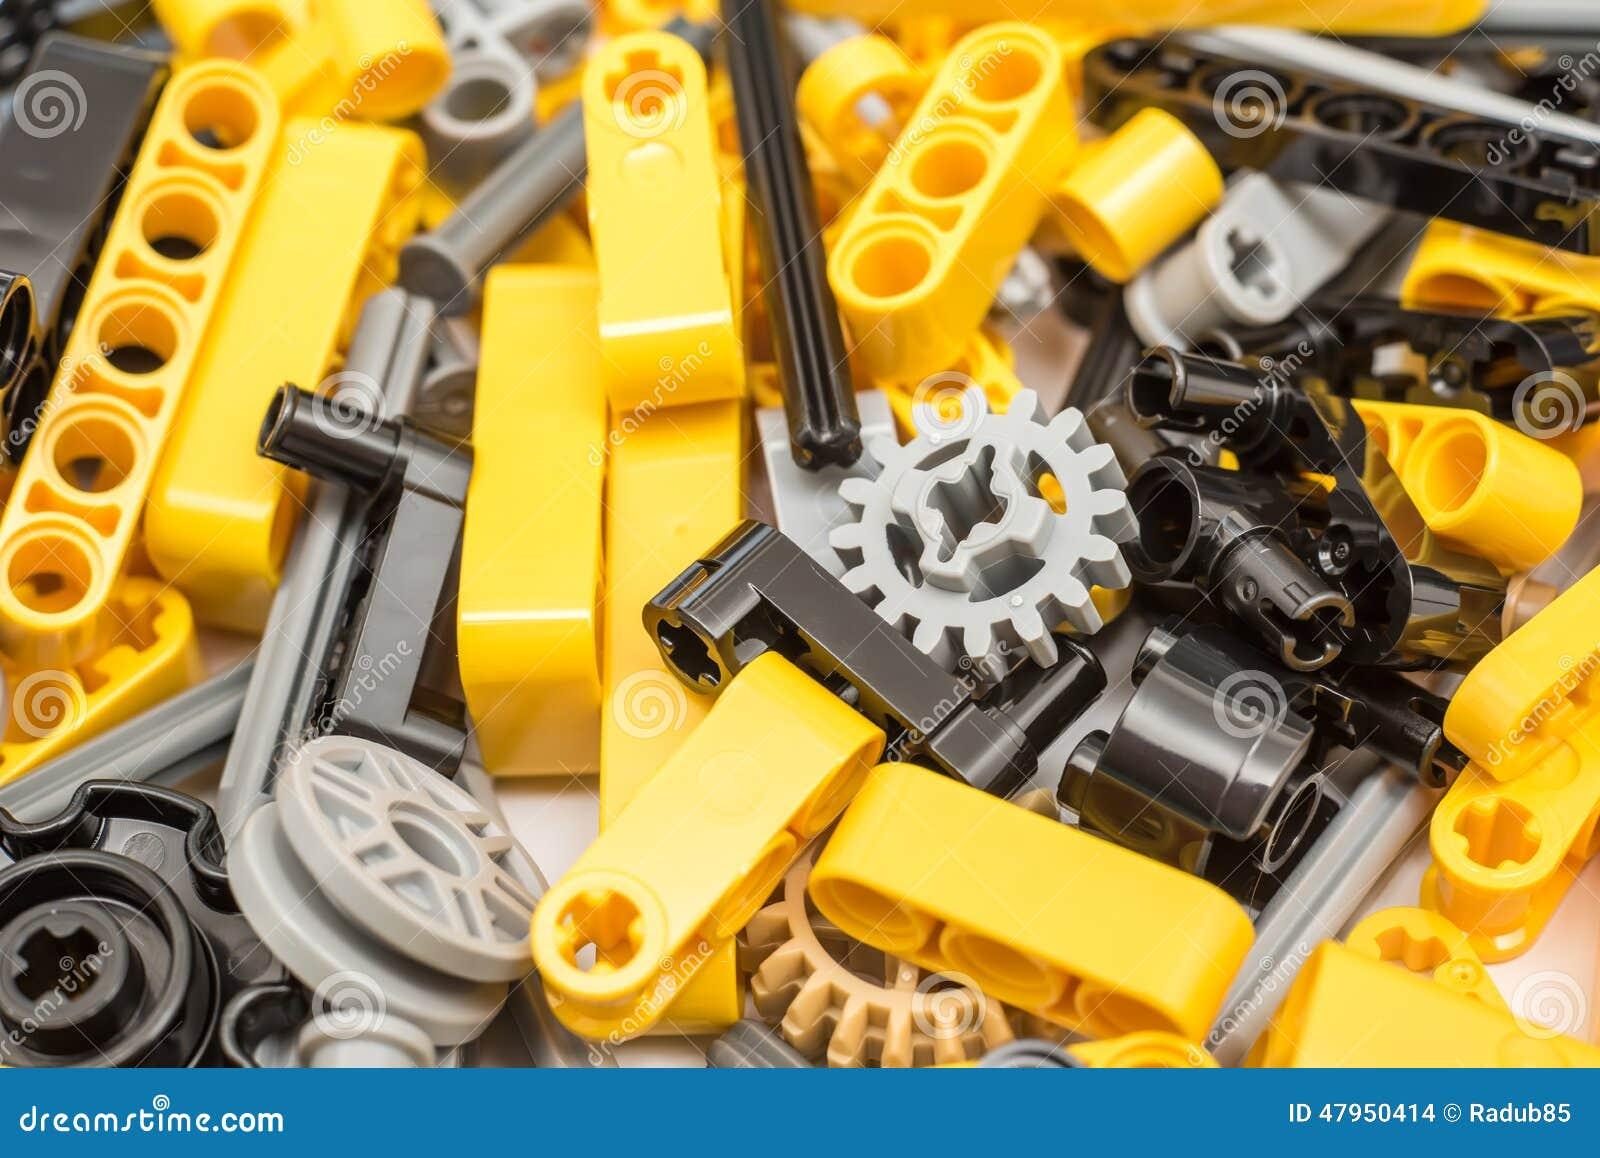 Lego Technic Pieces Pile Close upp